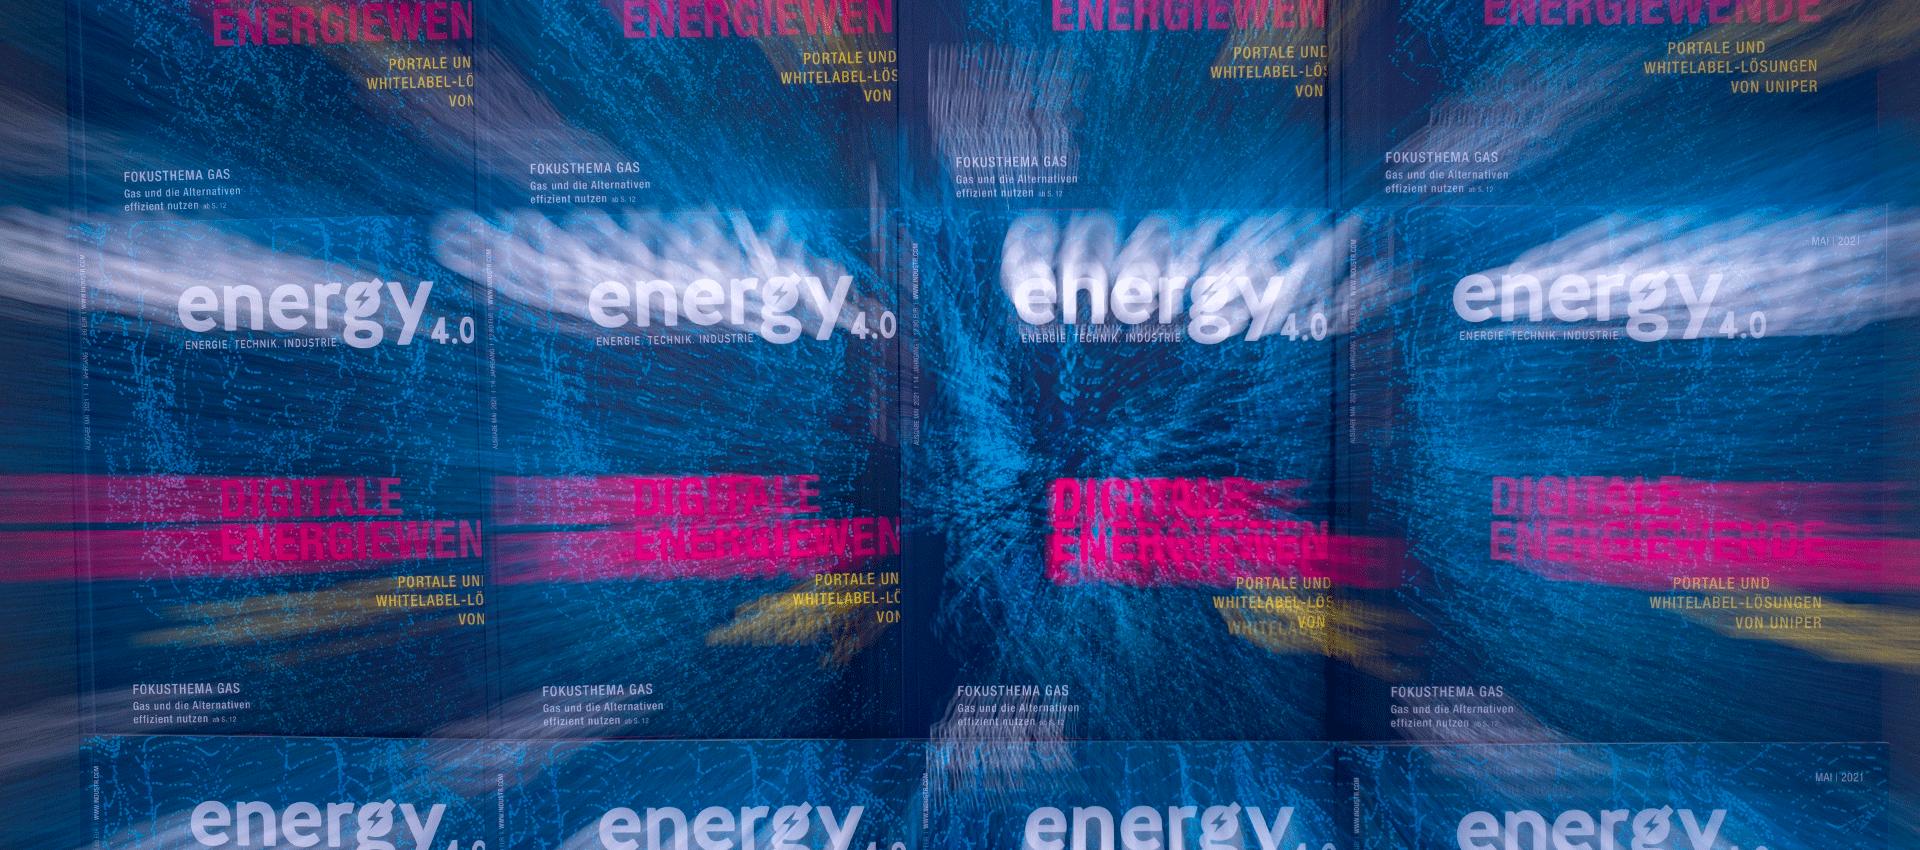 Energy 4.0 Mediadaten 2022